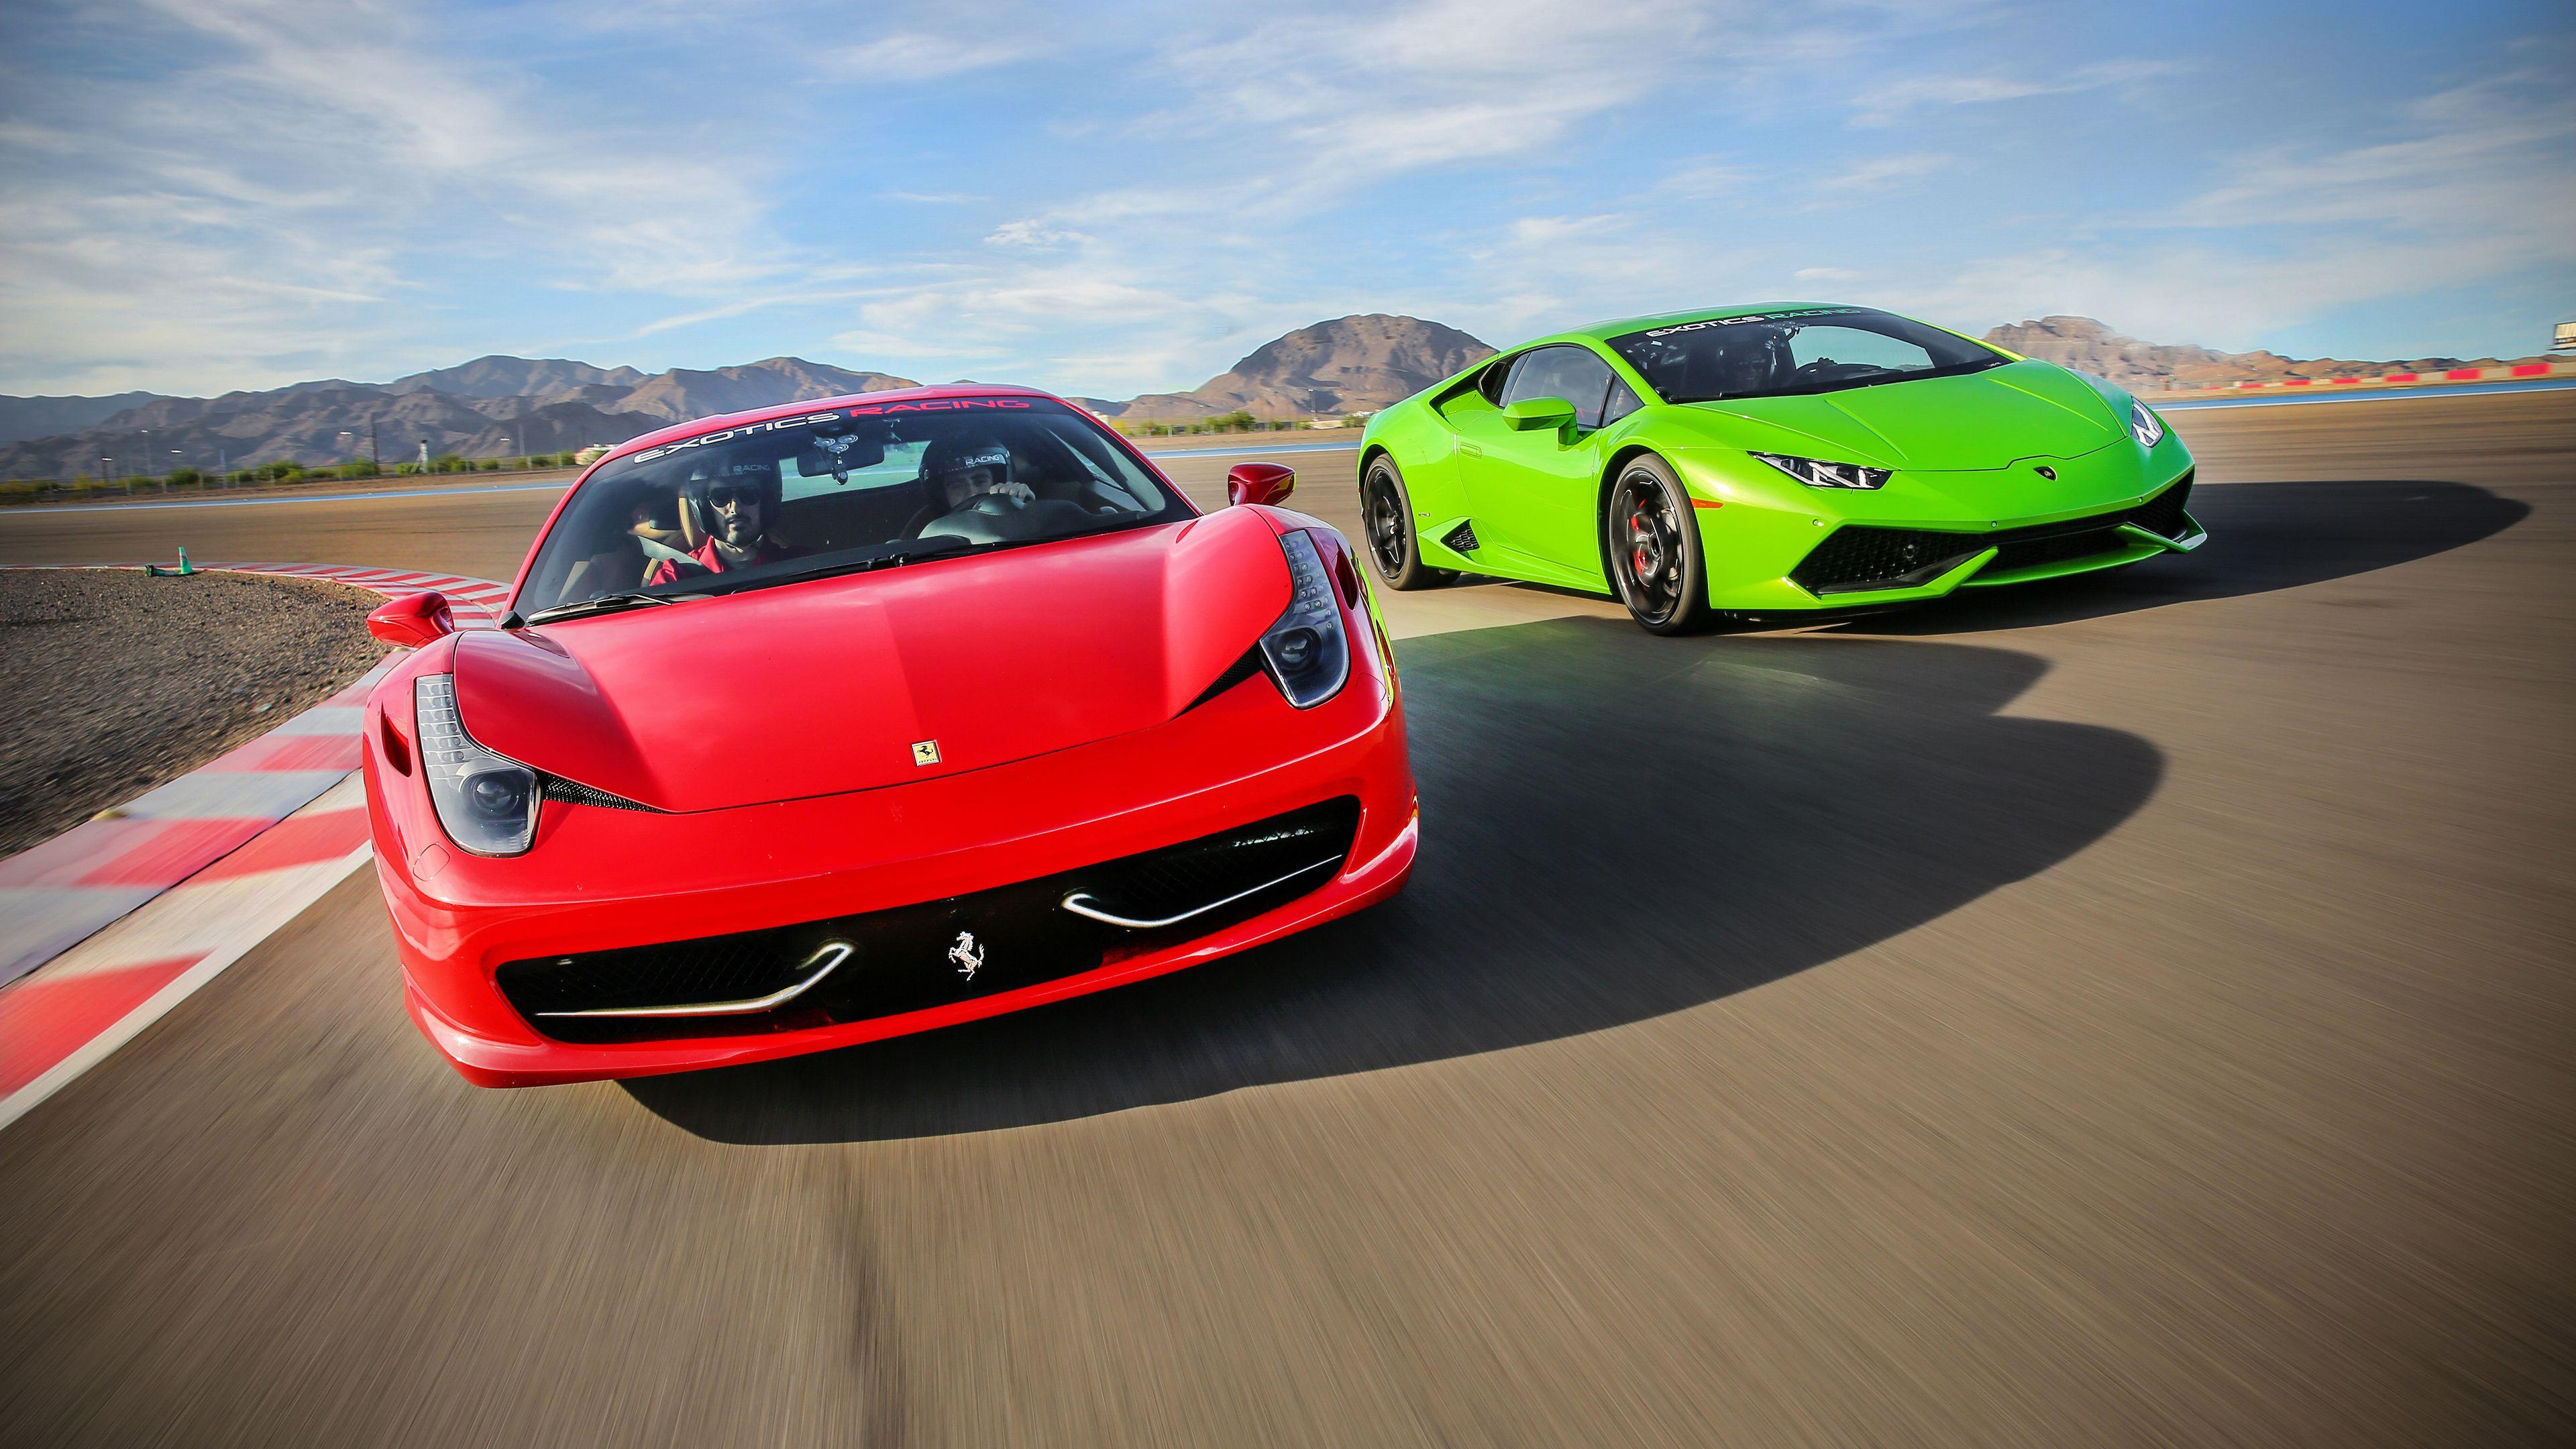 Supercar Racing Experience at Las Vegas Motor Speedway